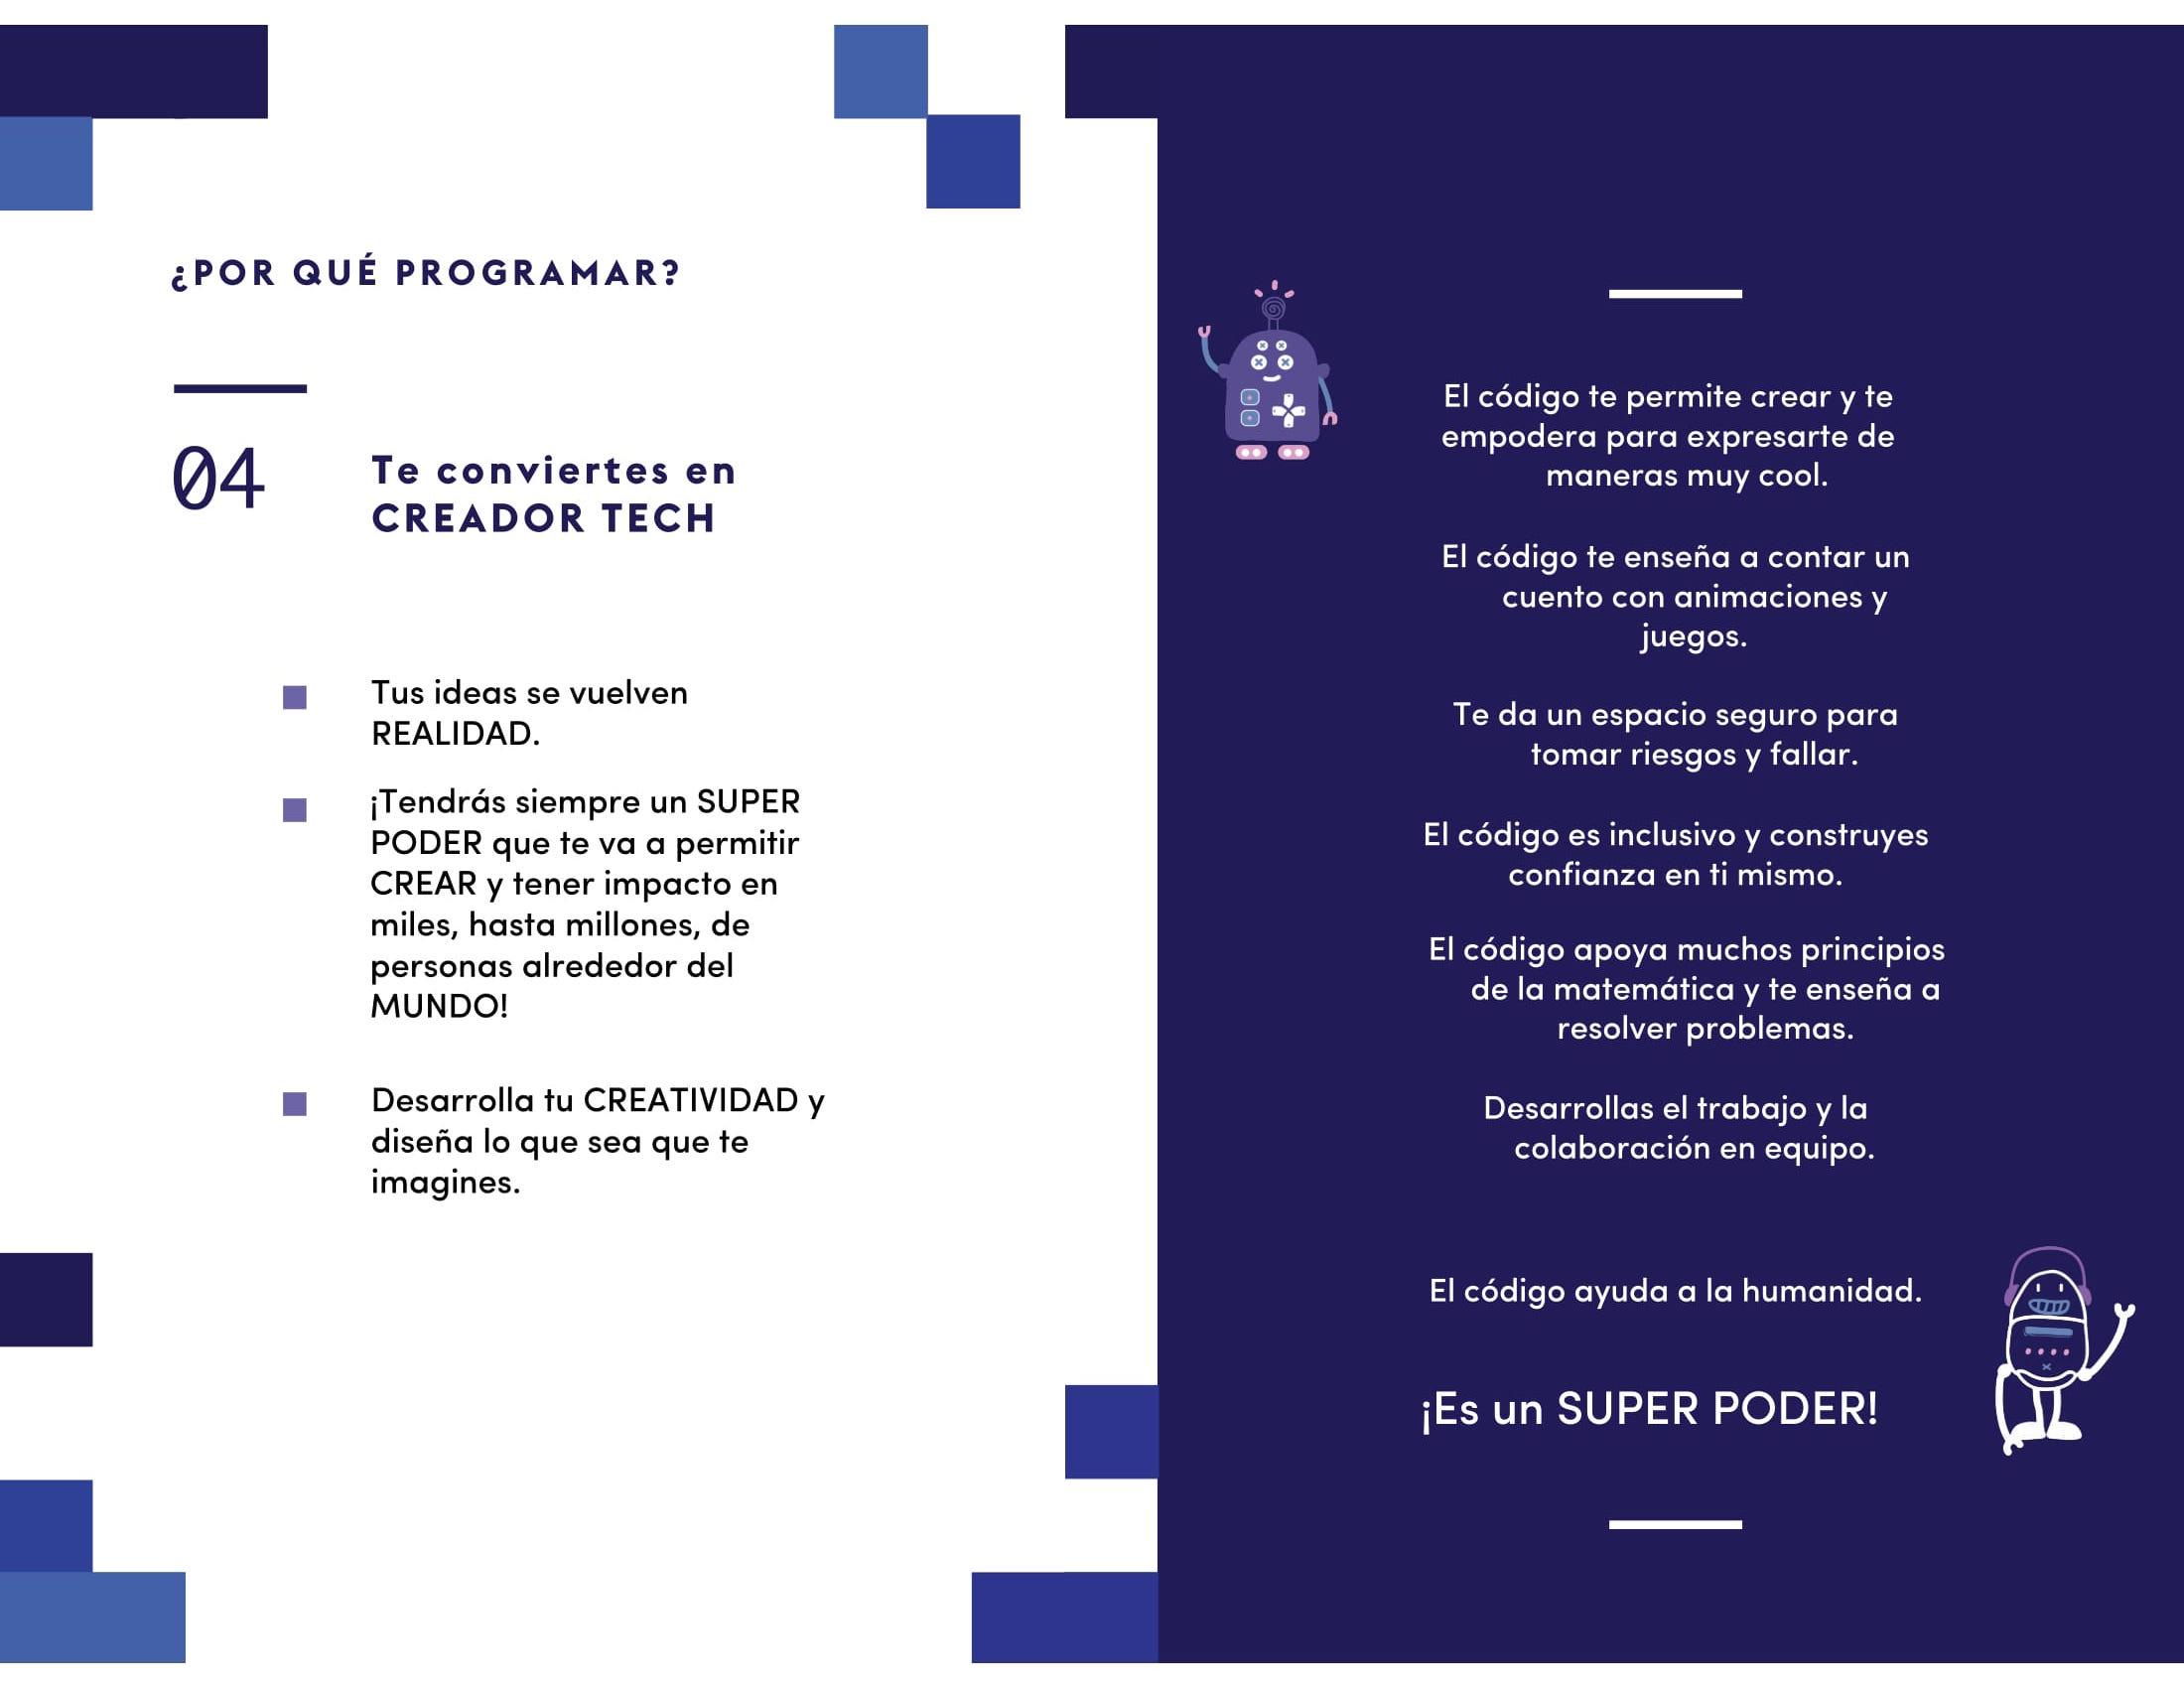 CDC_presentacion_1_Corregida.v6-4.jpg